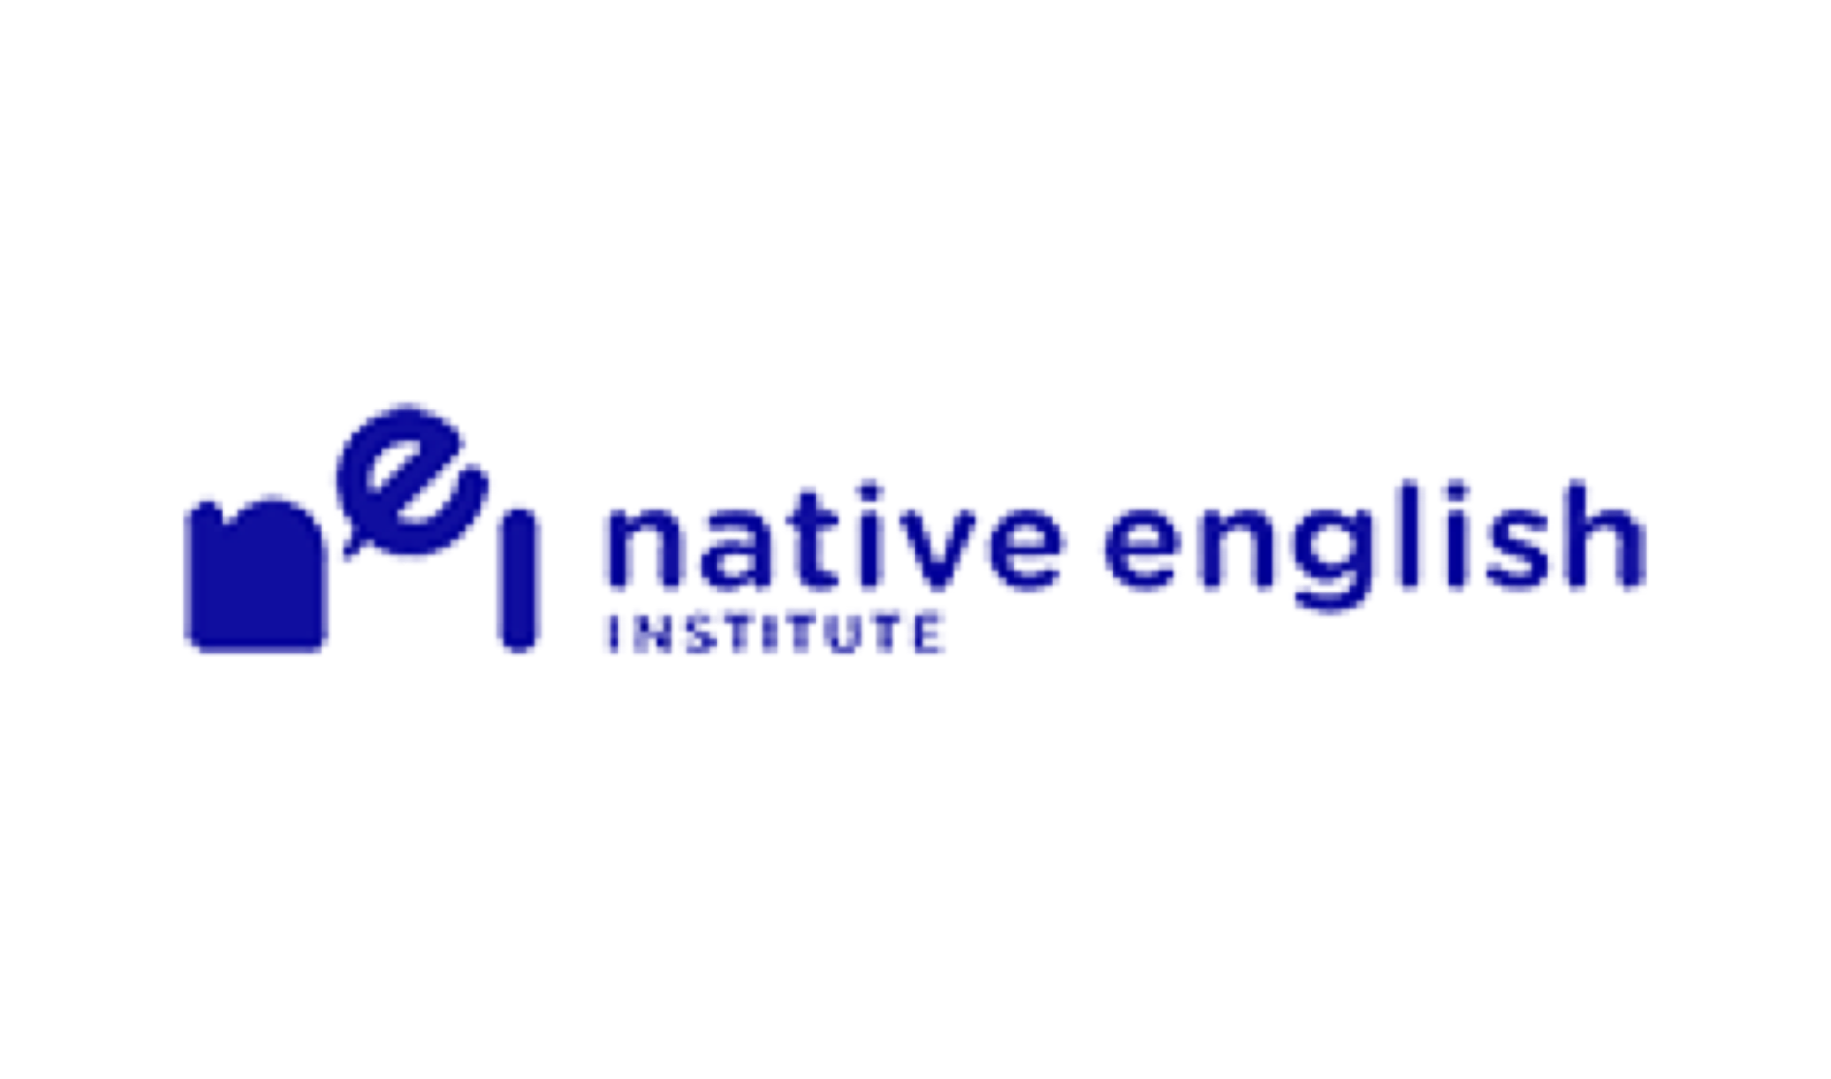 Native English Institute